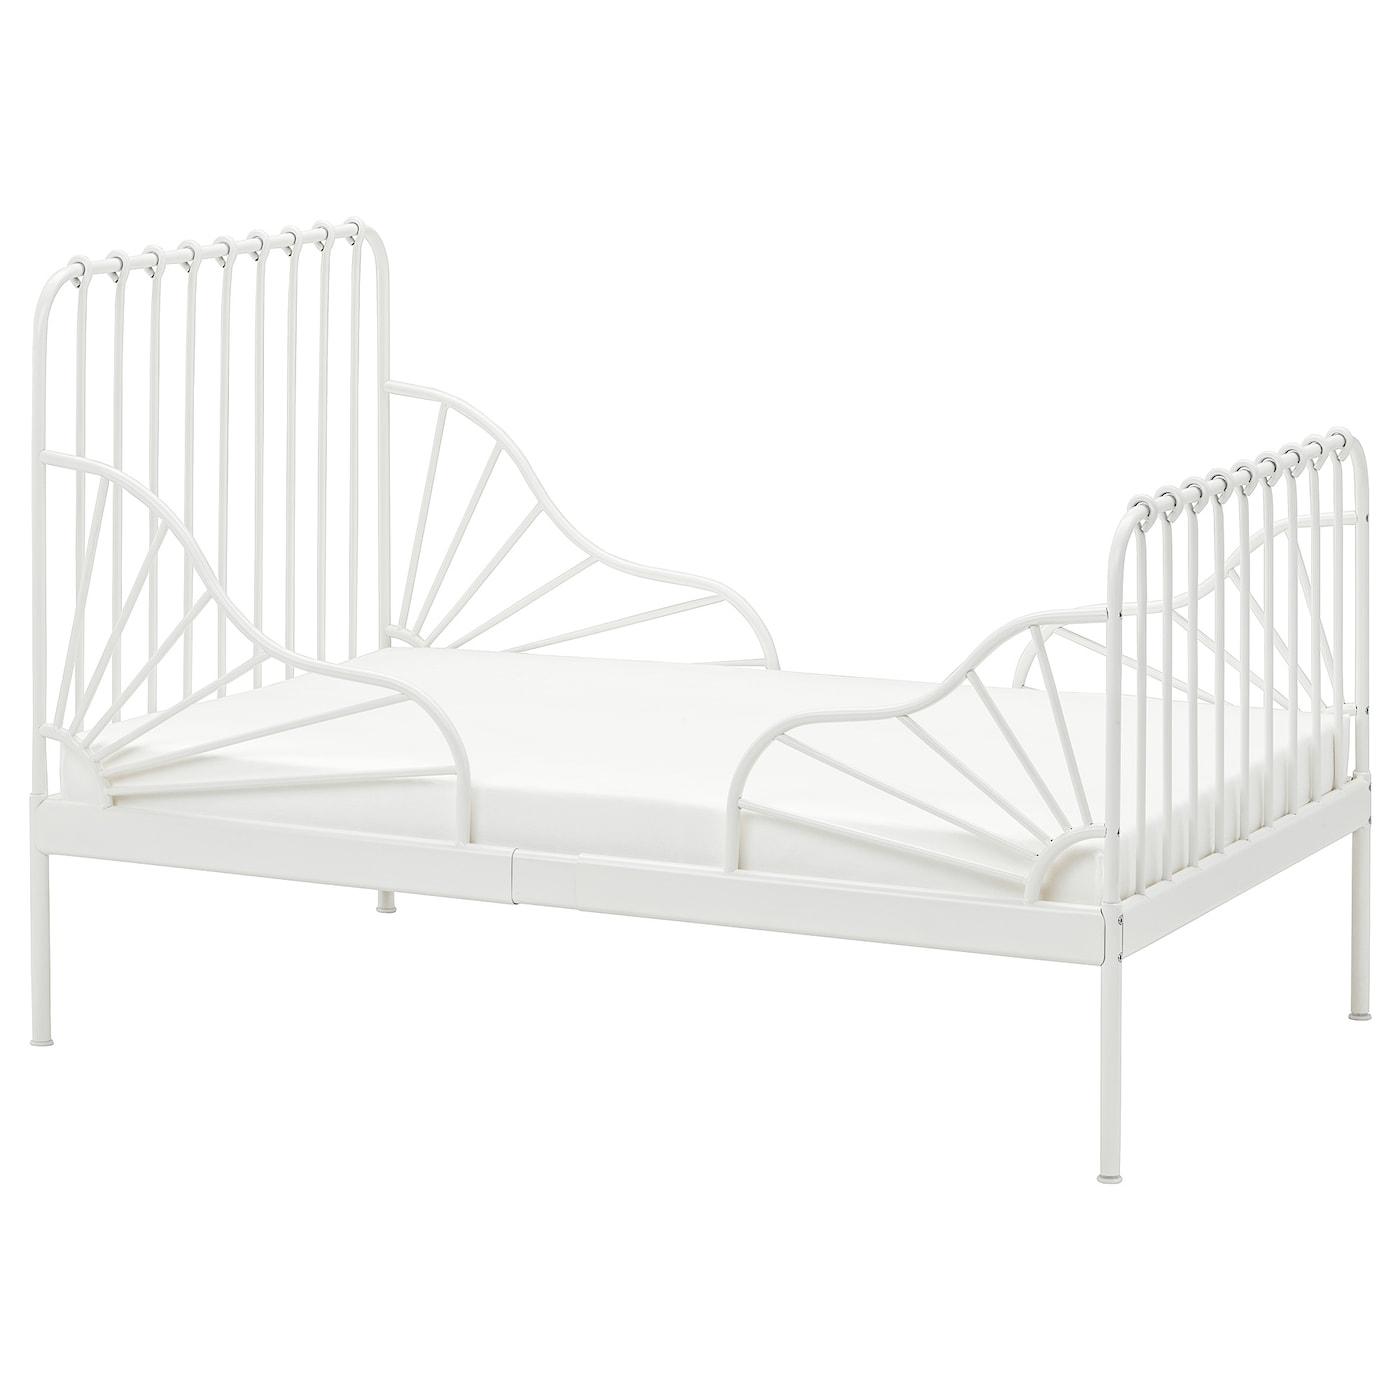 MINNEN Cama extensible blanco 80x200 cm